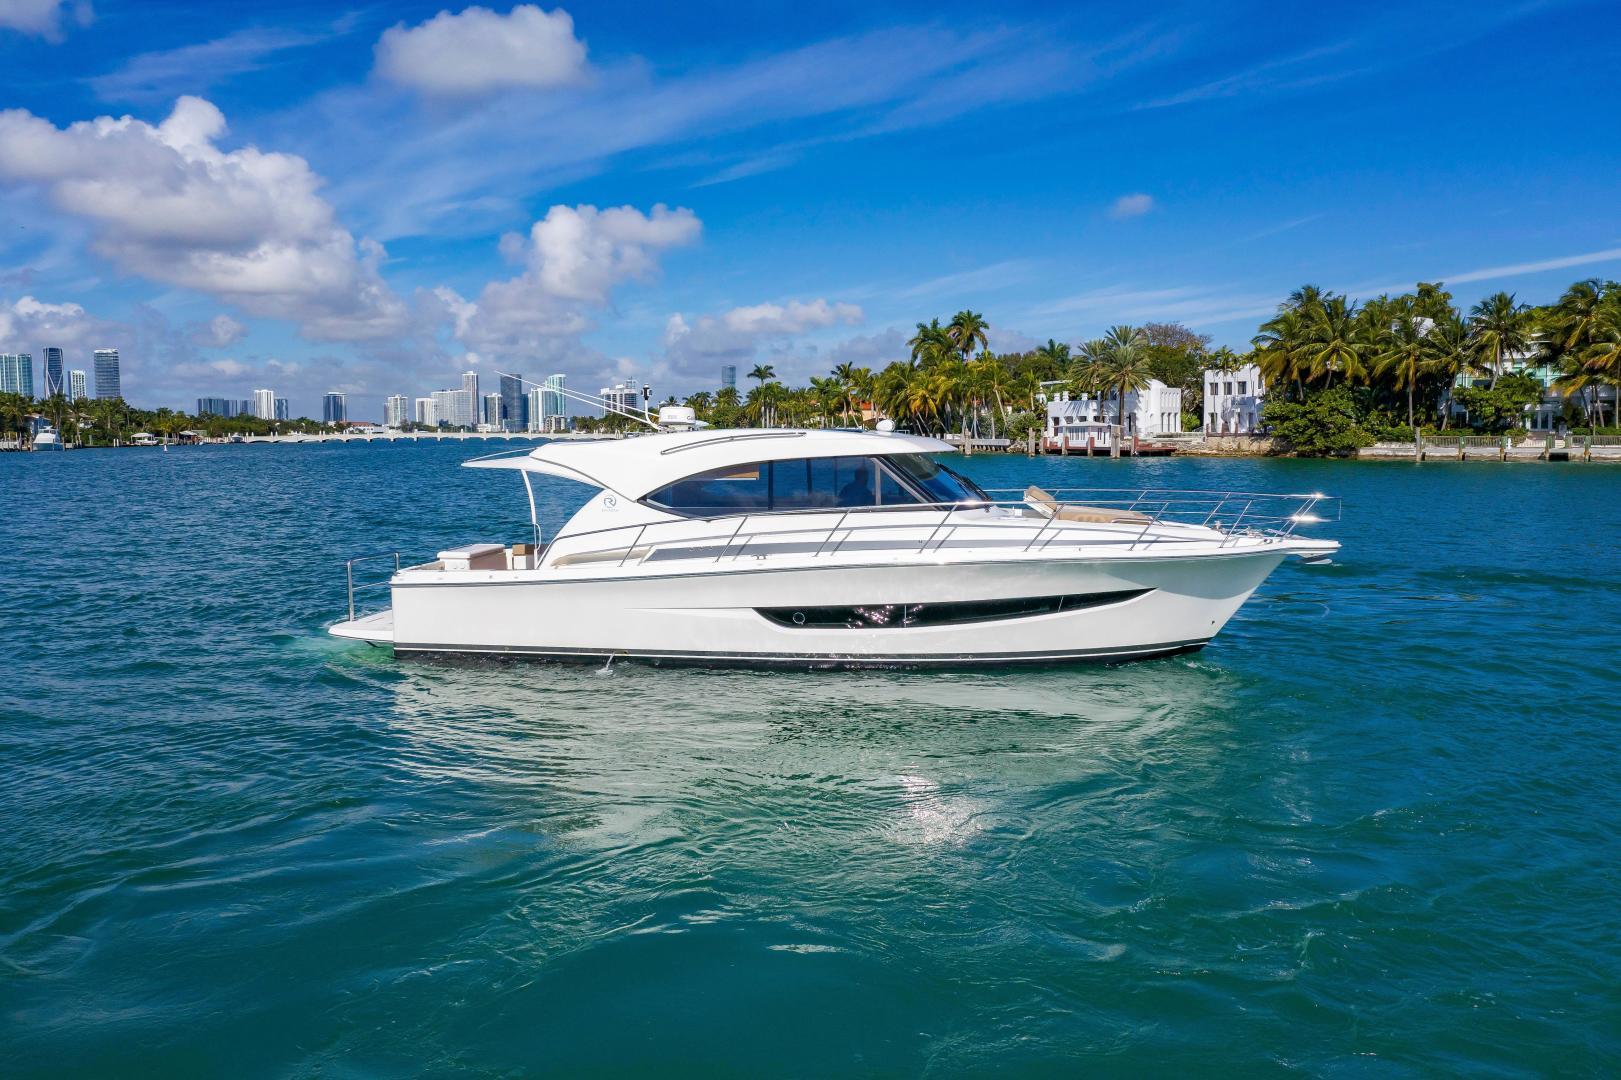 Riviera-395 SUV 2019-Ipanema Miami Beach-Florida-United States-1614870   Thumbnail